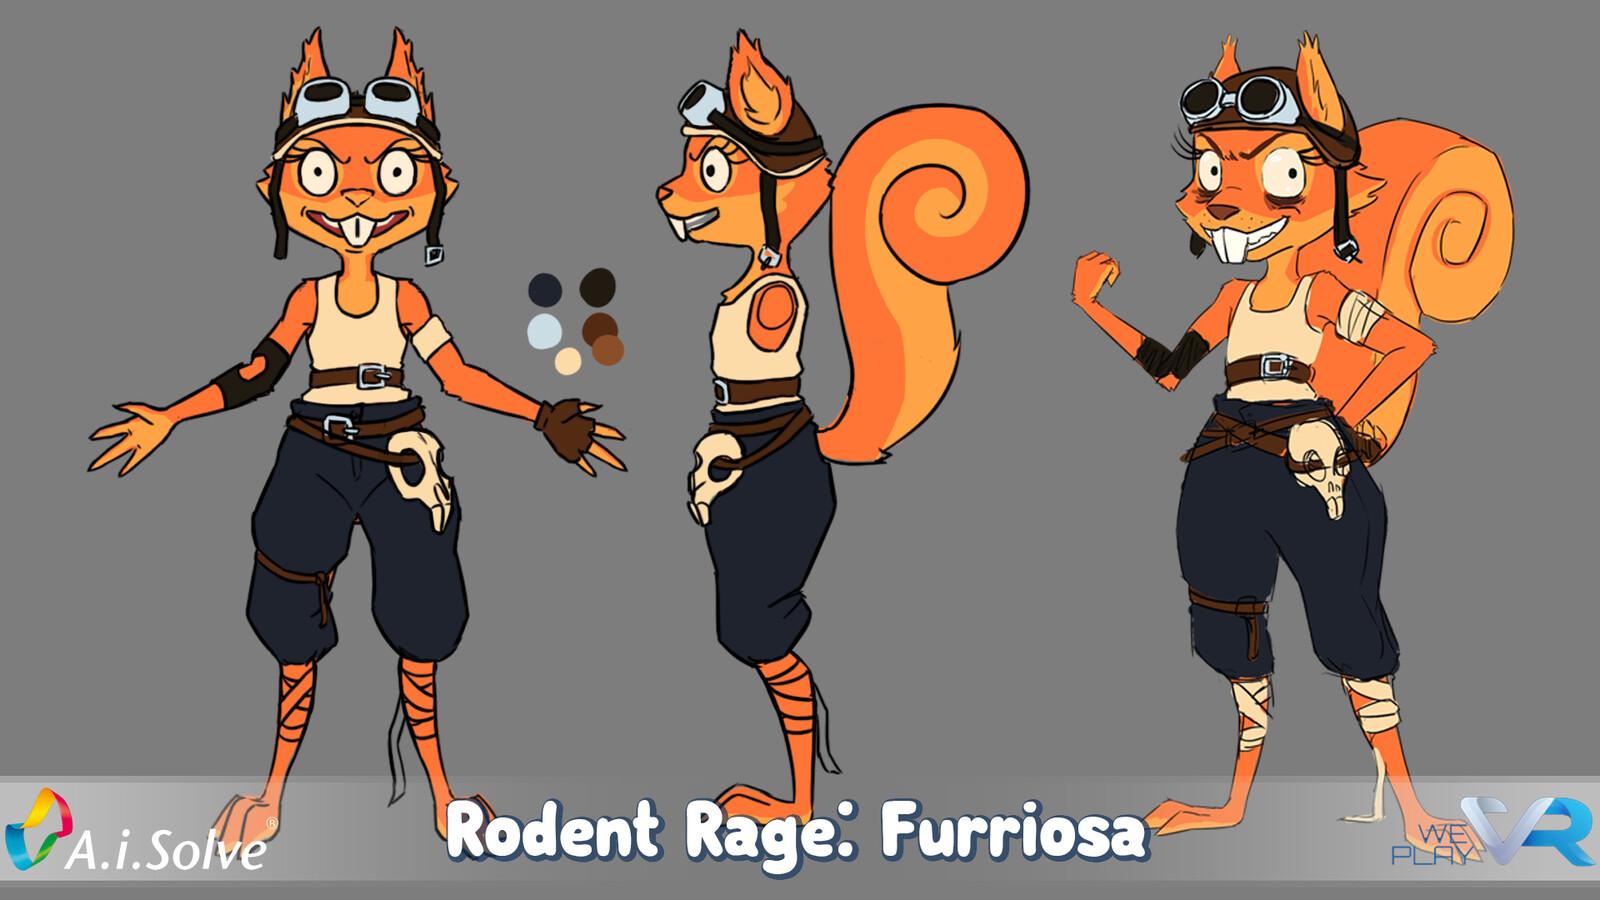 Rodent Rage: Furriosa